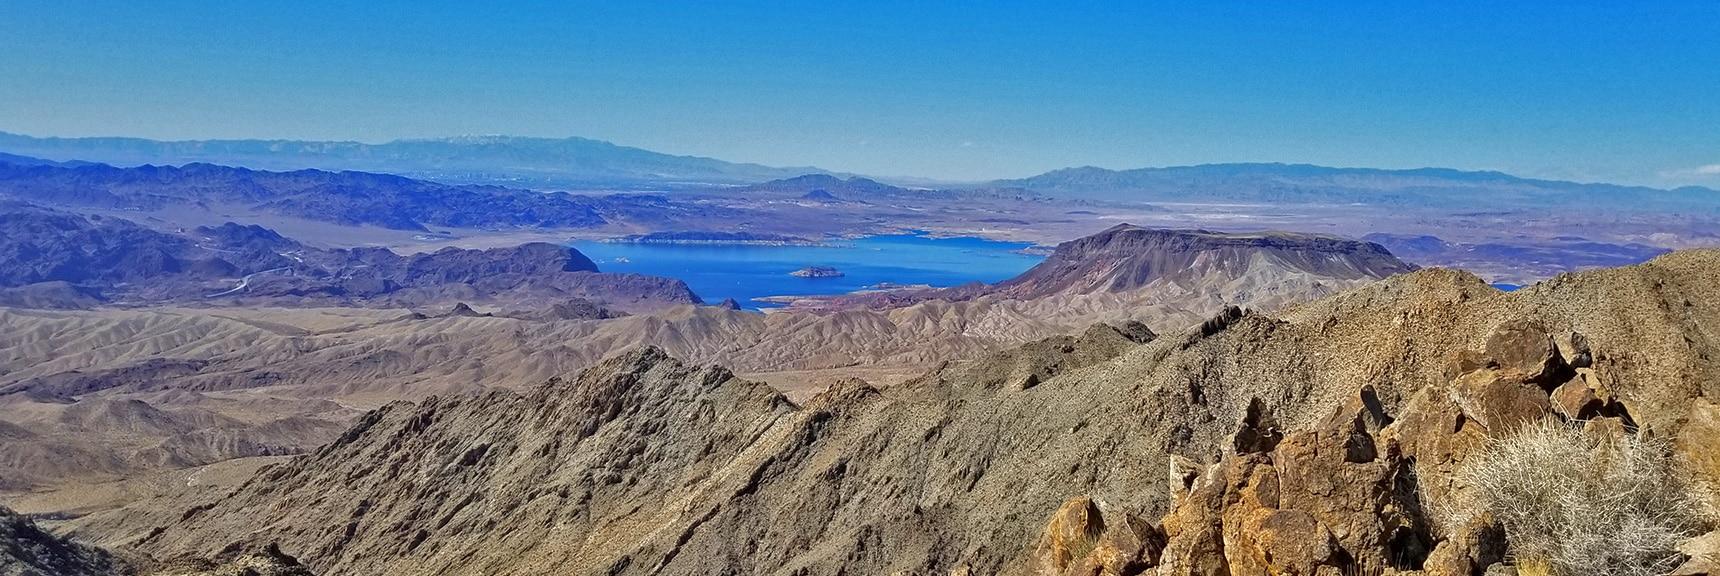 Lake Mead, Frenchman Mt., Mt. Charleston Wilderness, Gass, Peak, Sheep Range, Fortification Hill, Las Vegas Strip | Mt Wilson, Black Mountains, Arizona, Lake Mead National Recreation Area